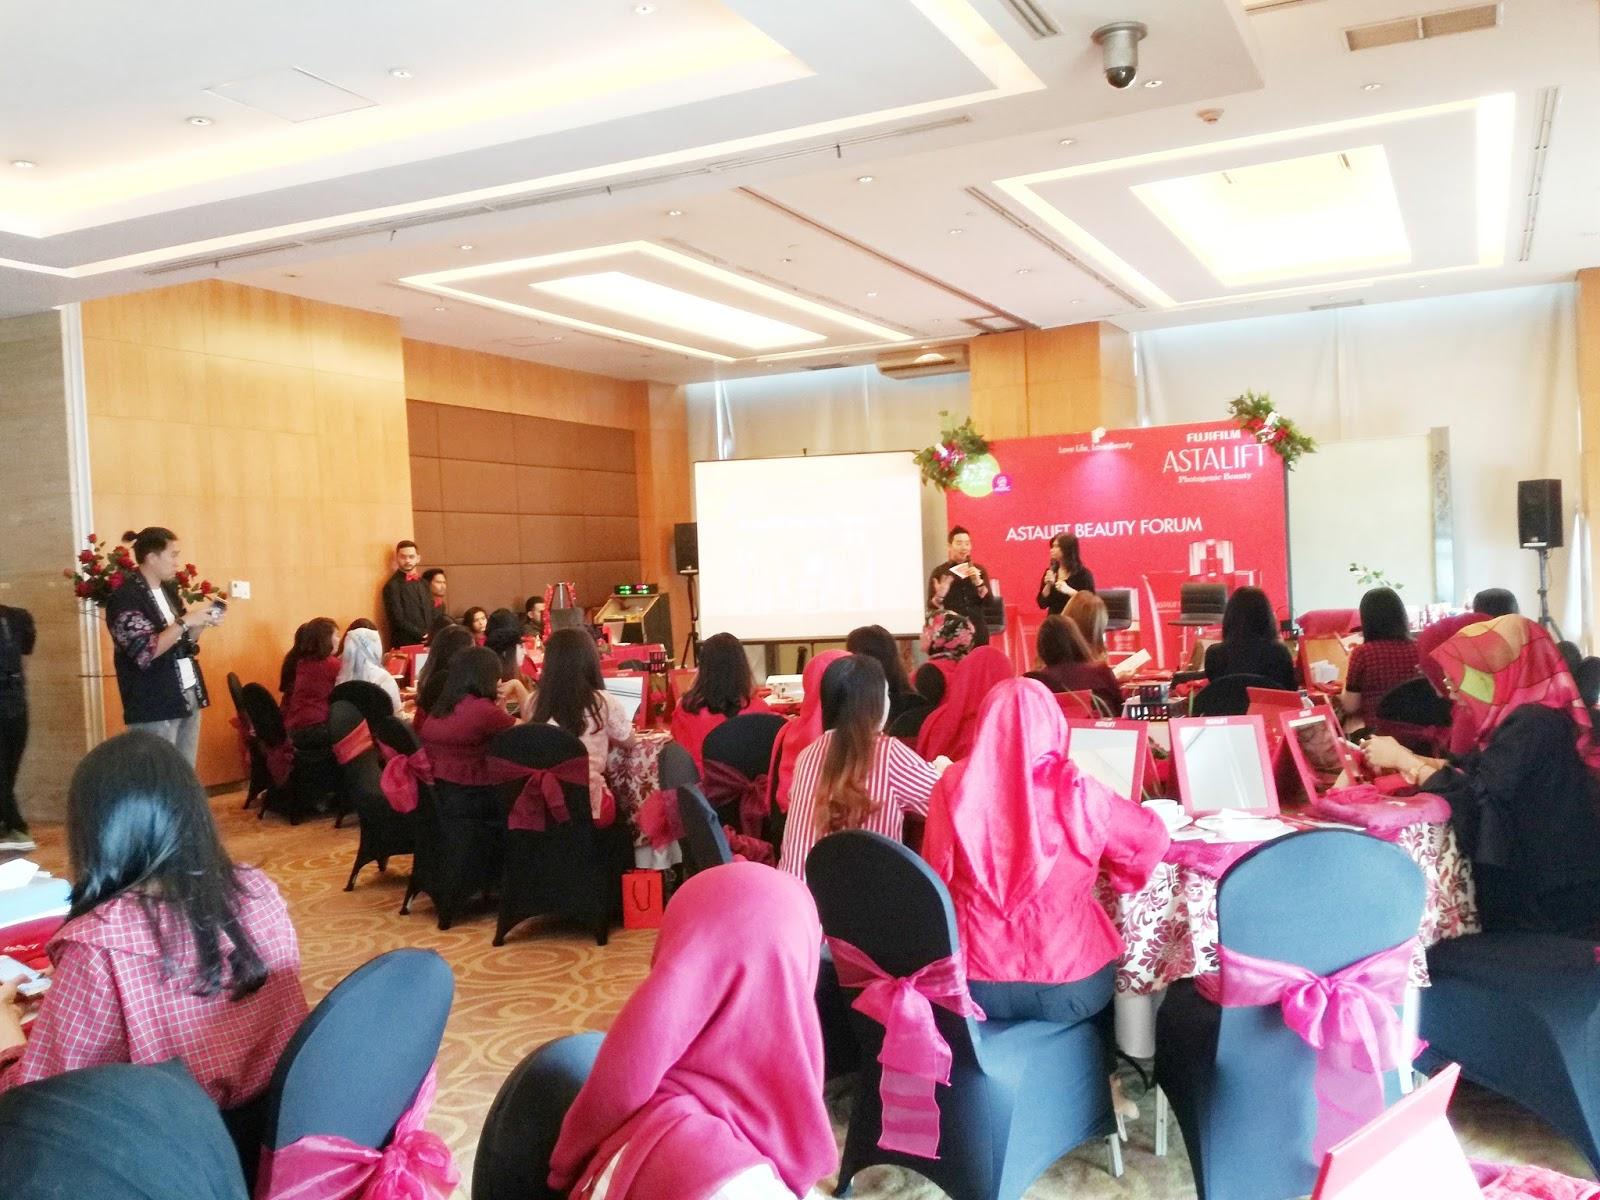 Event] Fujifilm Astalift Photogenic Beauty Forum in Medan